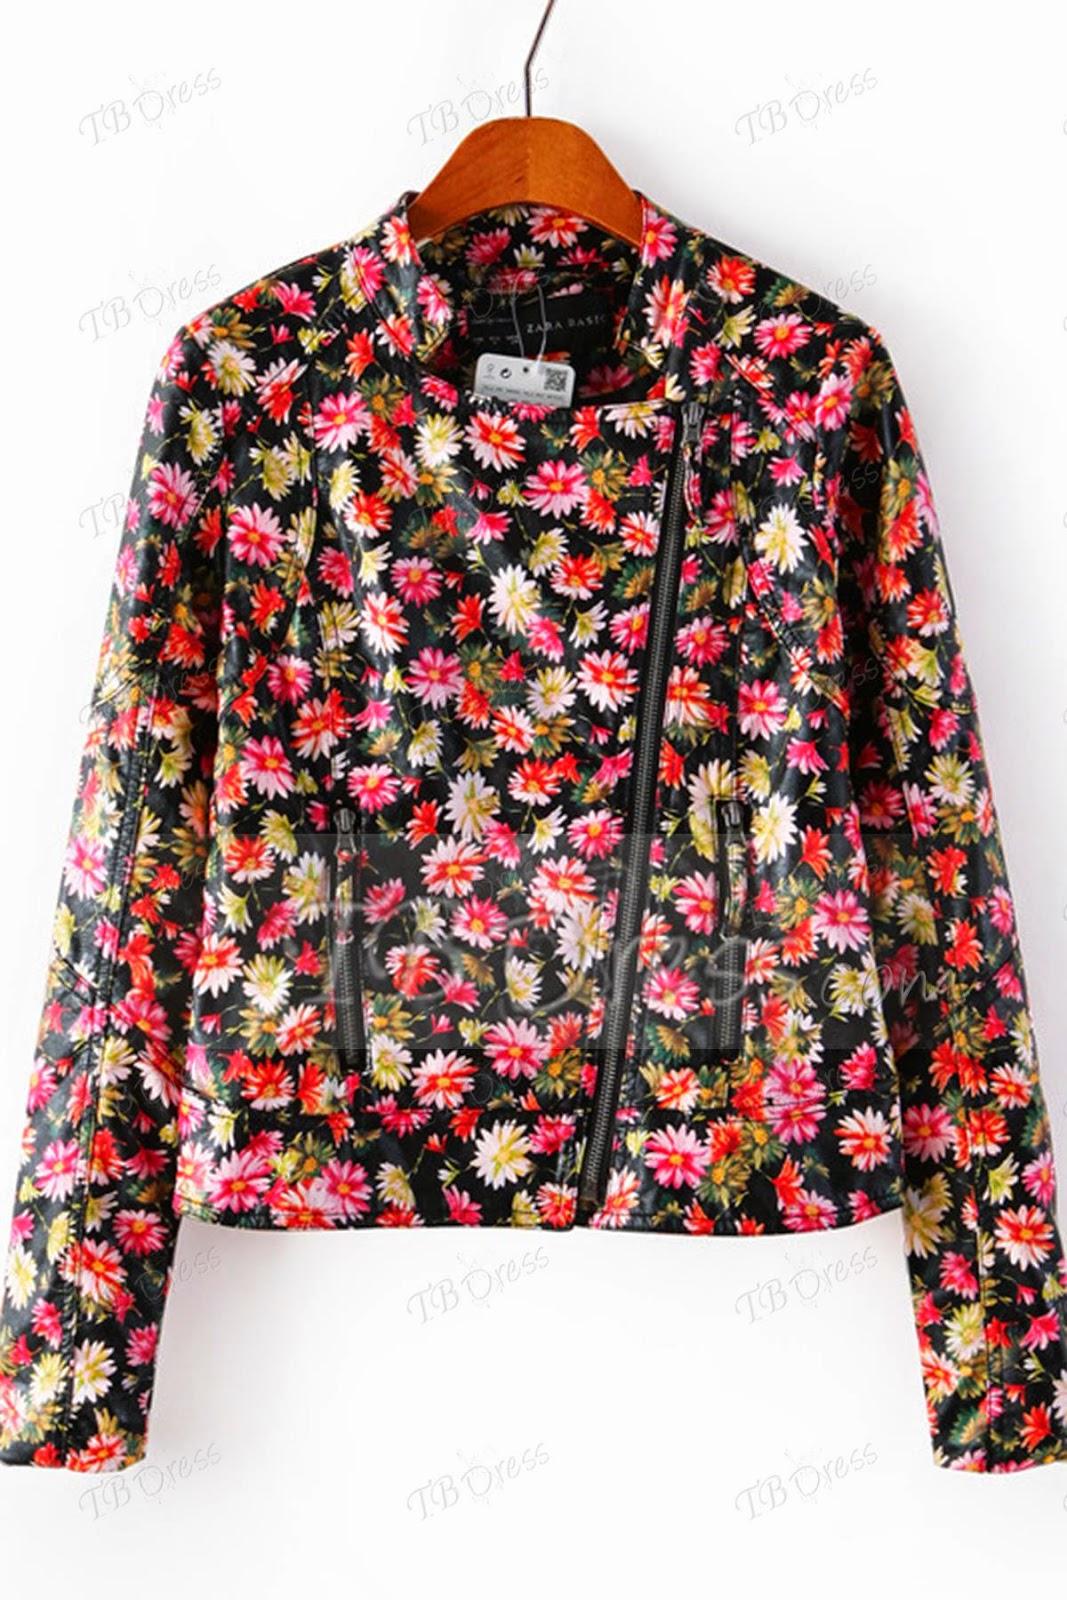 http://www.tbdress.com/product/Long-Sleeve-Floral-Zipper-Jacket-10987330.html